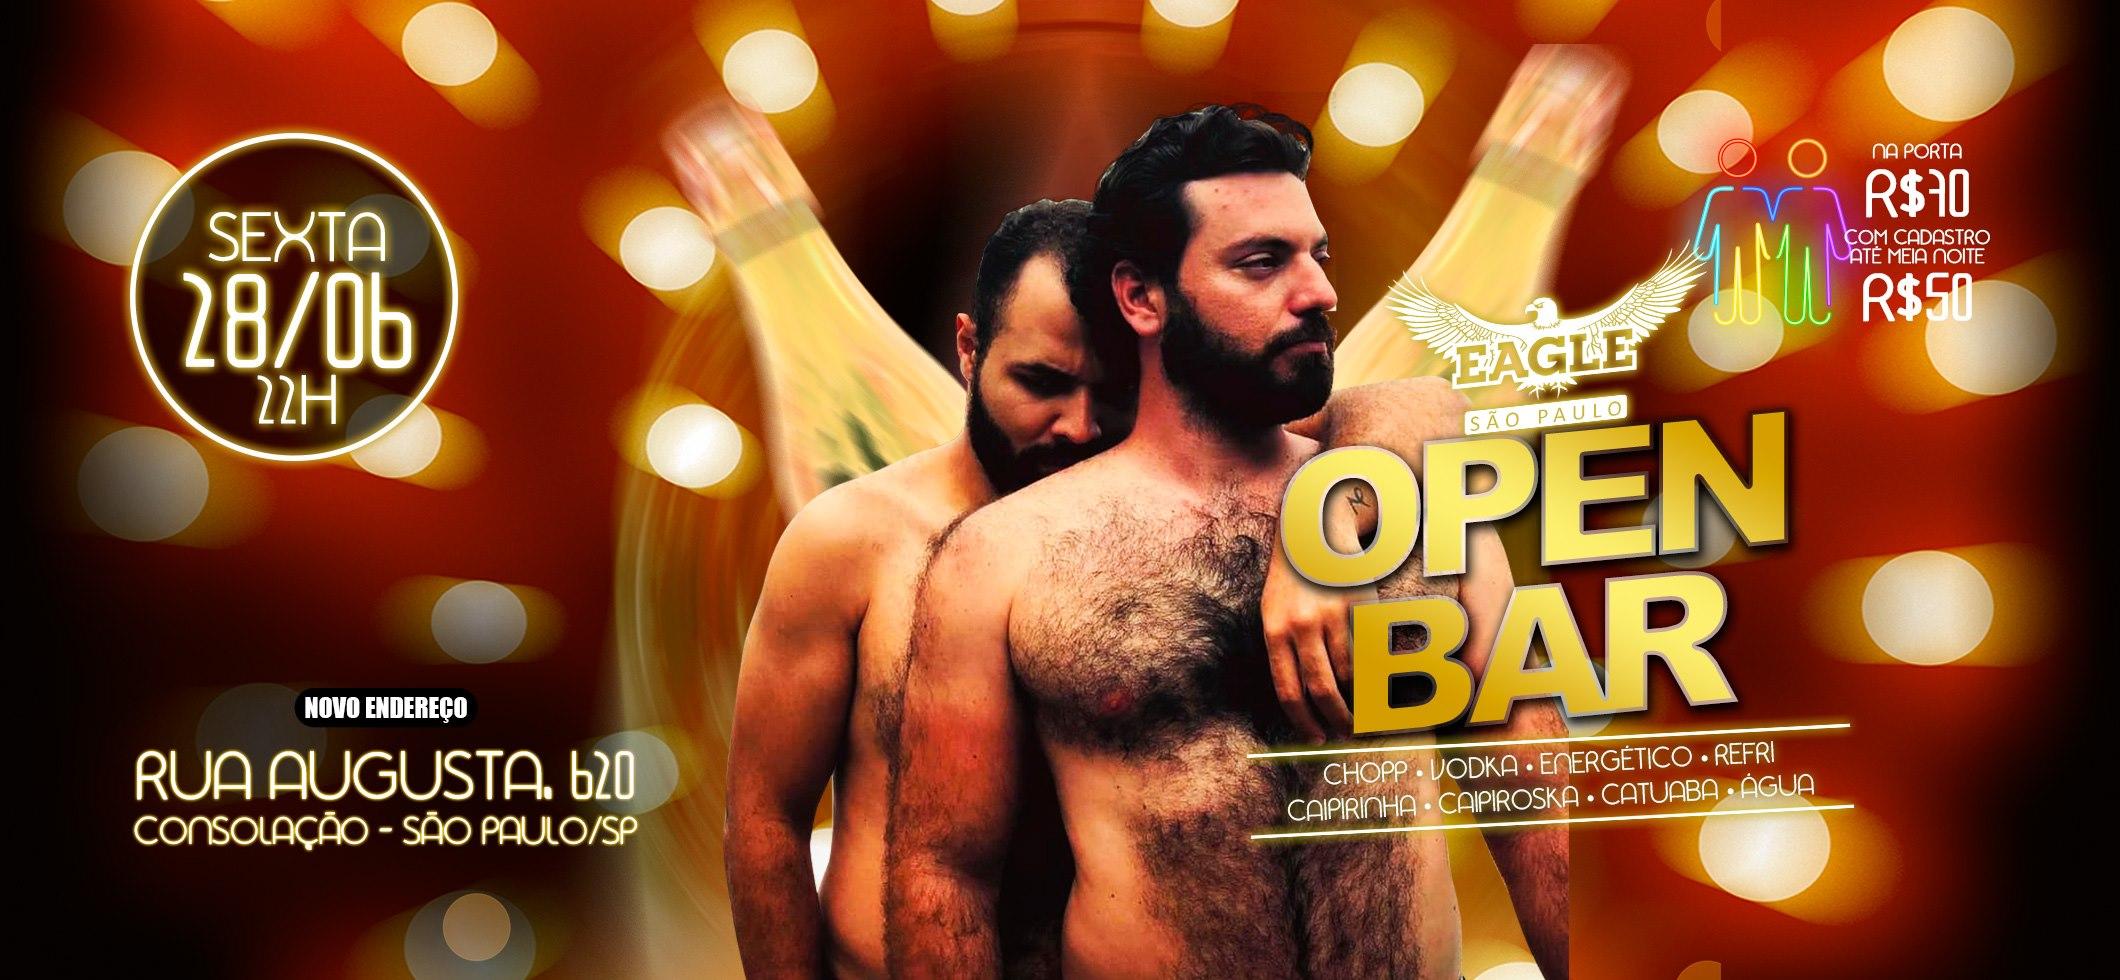 EAGLE OPEN BAR Sex 28 Jun às 22h a São Paulo le ven 28 giugno 2019 22:00-05:00 (Clubbing Gay)